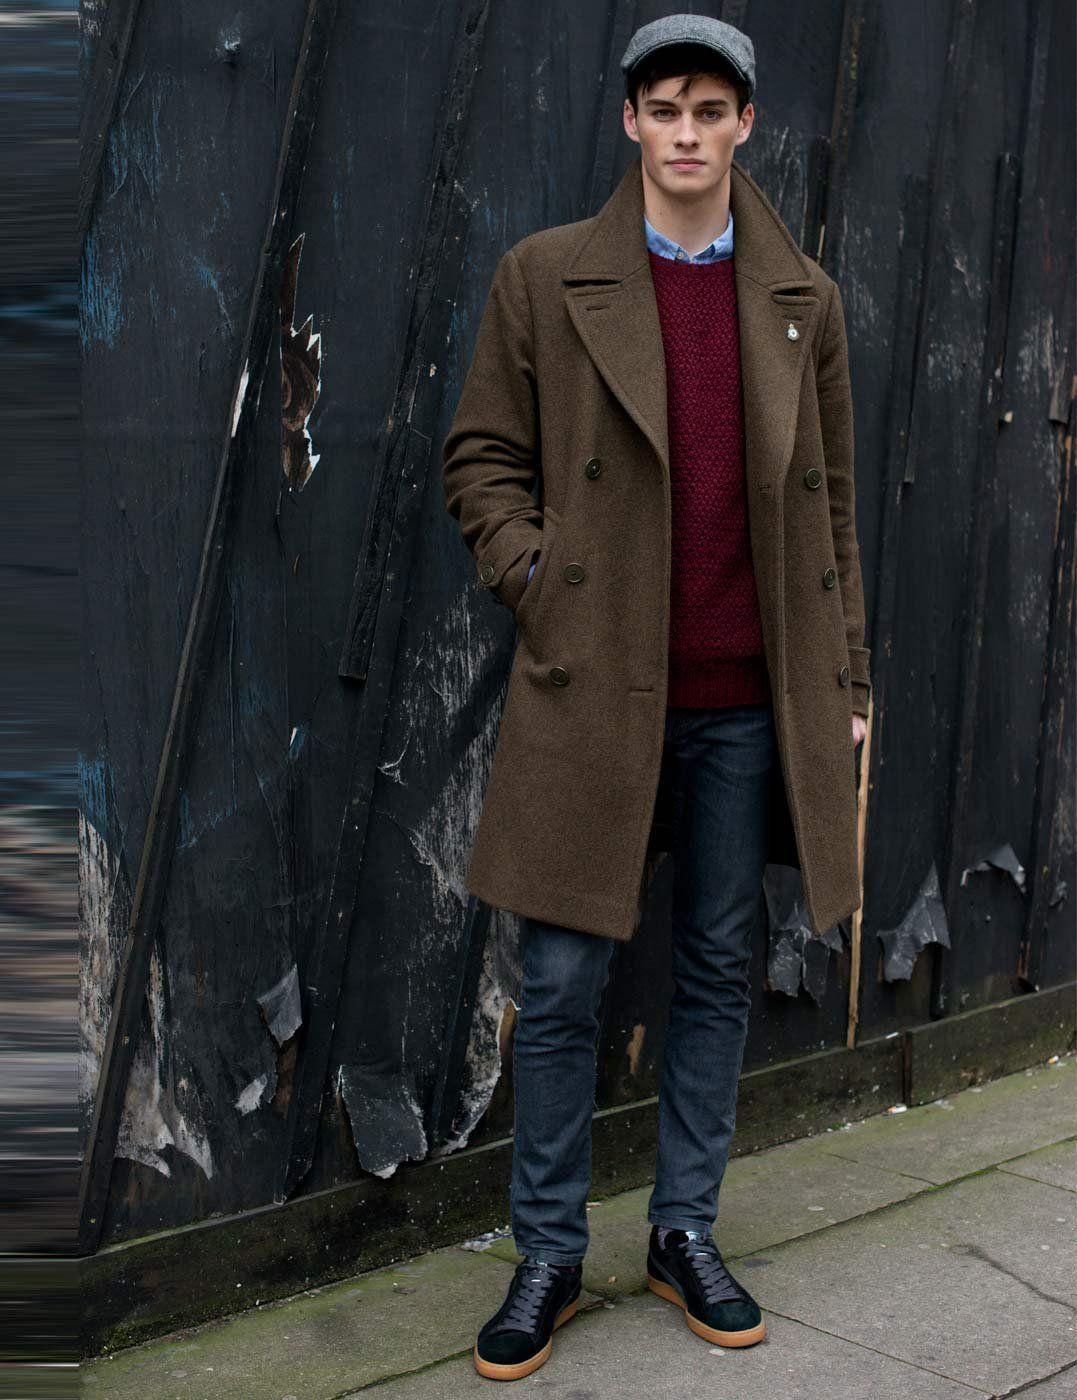 London Collections Men AW13 street style | Men's Fashion | Menswear | Moda Masculina | Ropa para Hombres | Estilo Urbano | Shop at designerclothingfans.com